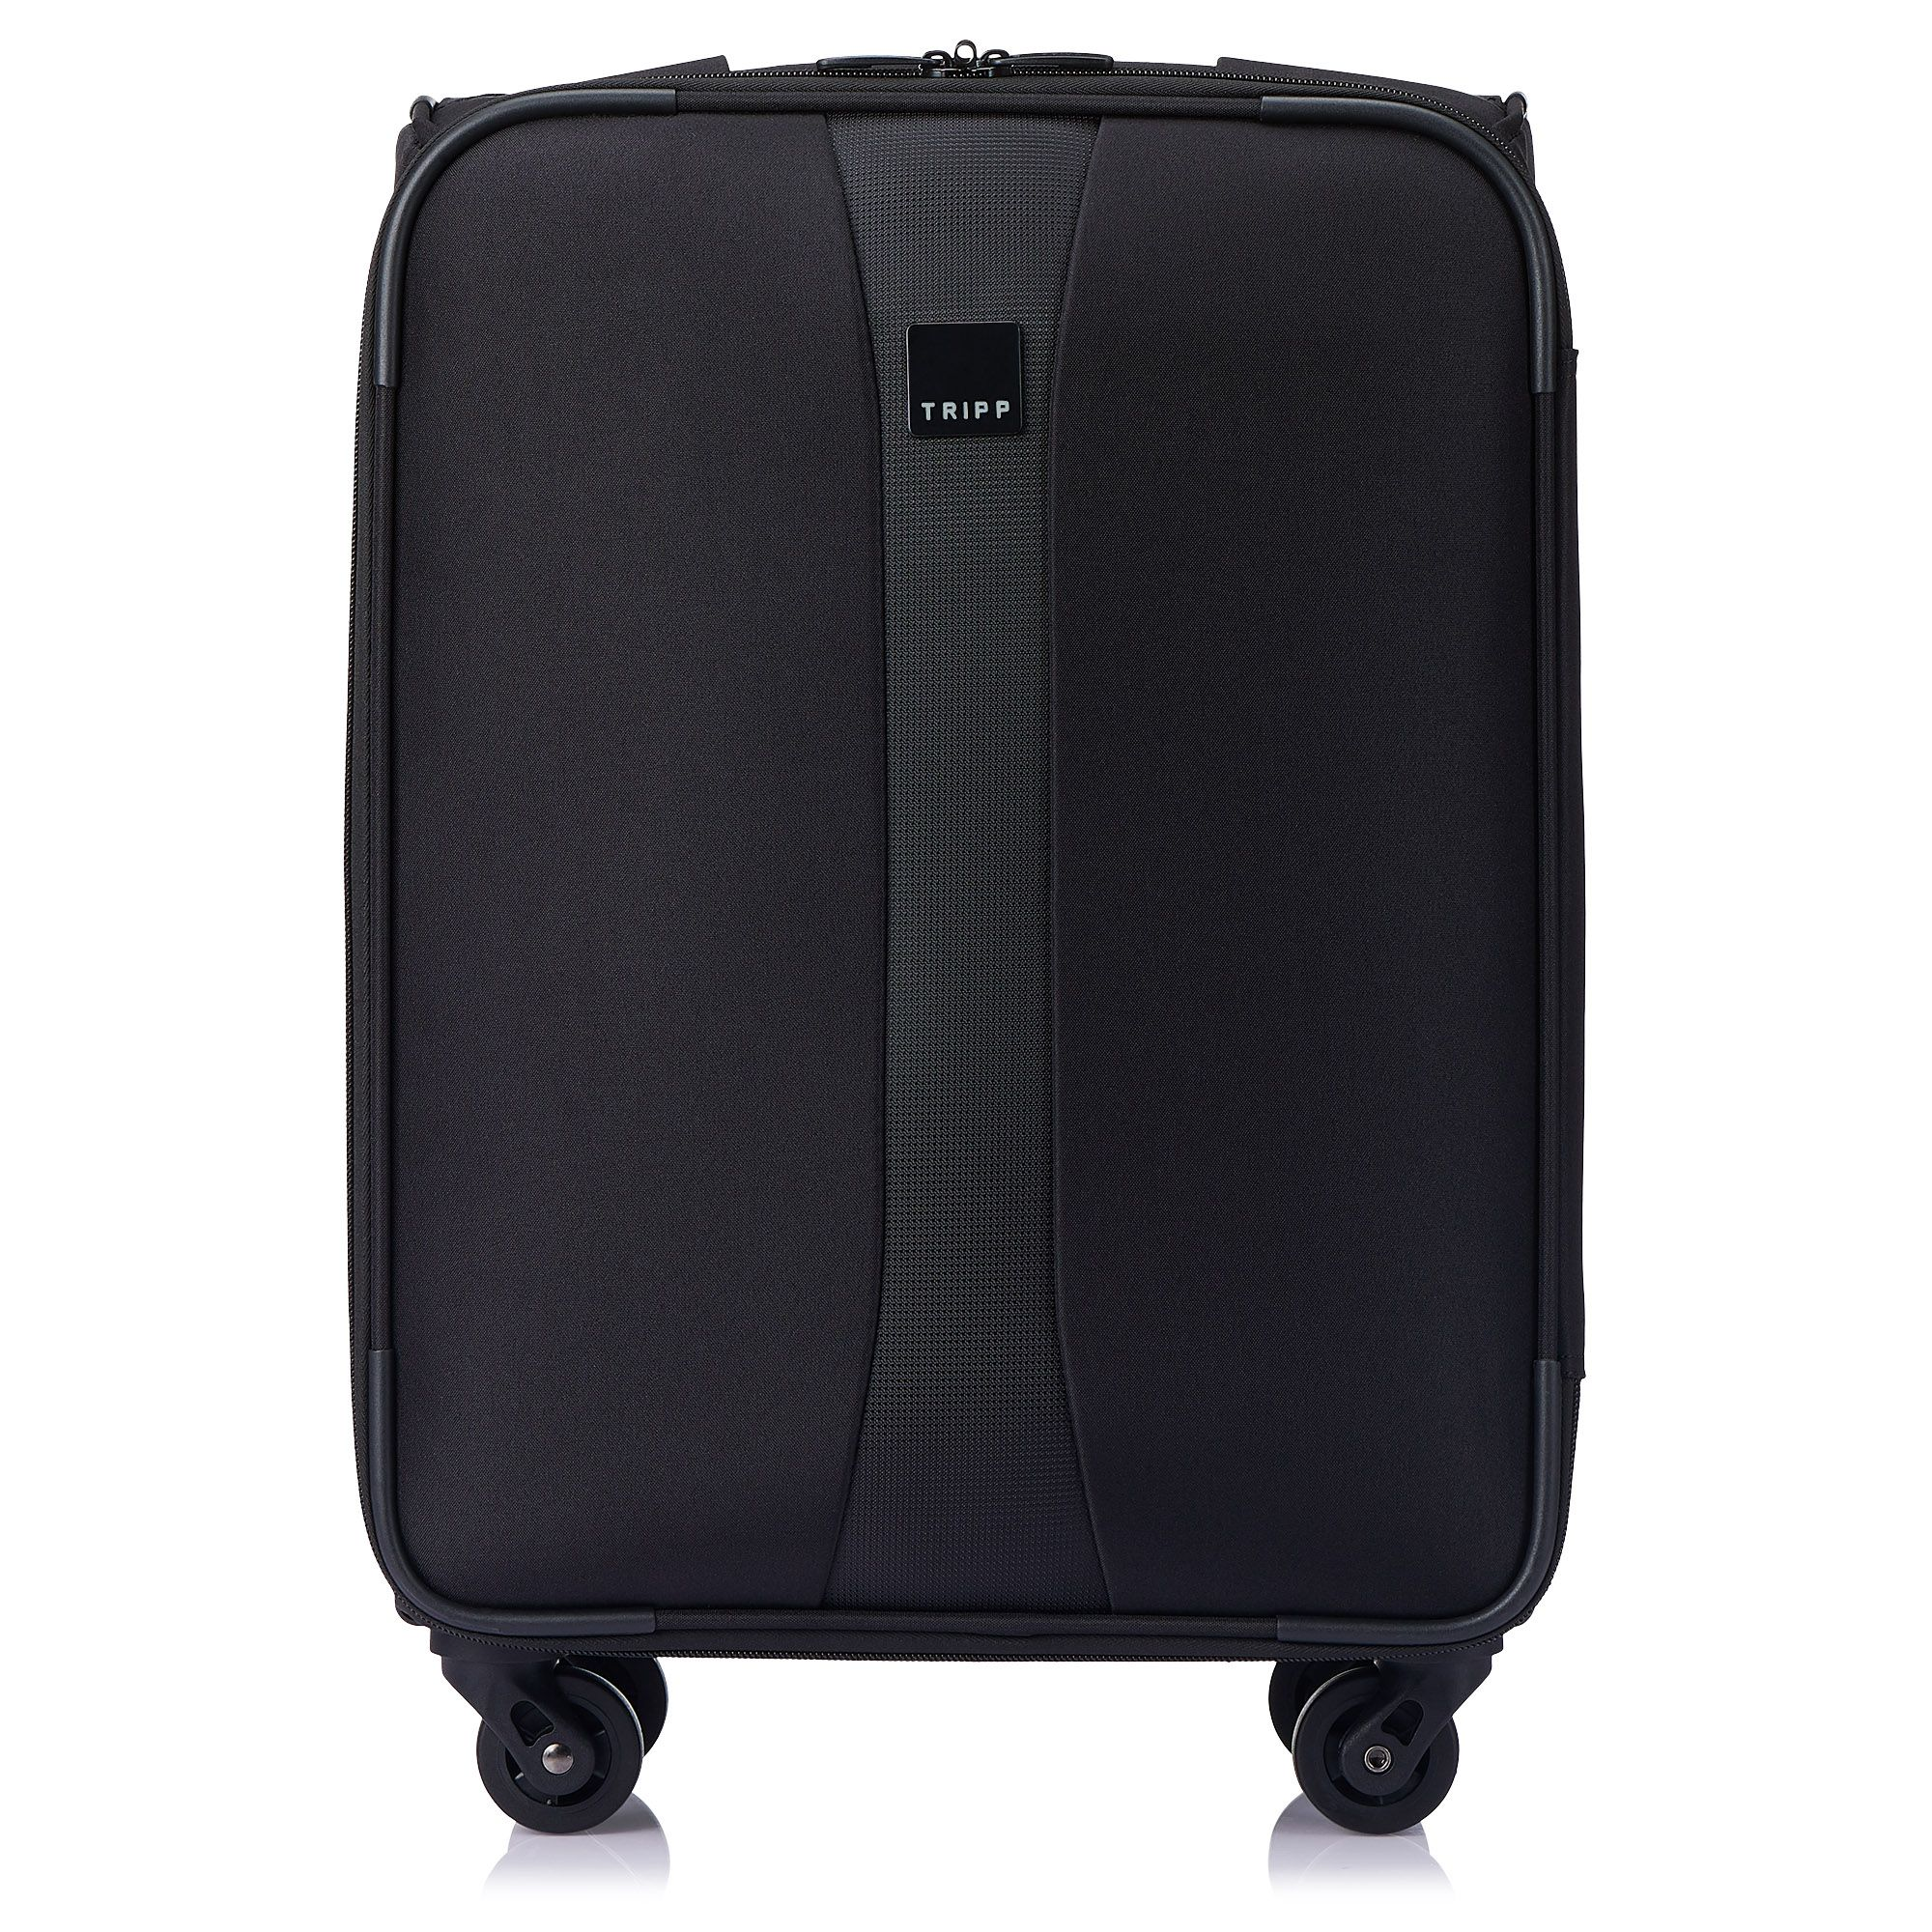 tripp black 39 superlite 4w 39 4 wheel cabin suitcase soft. Black Bedroom Furniture Sets. Home Design Ideas